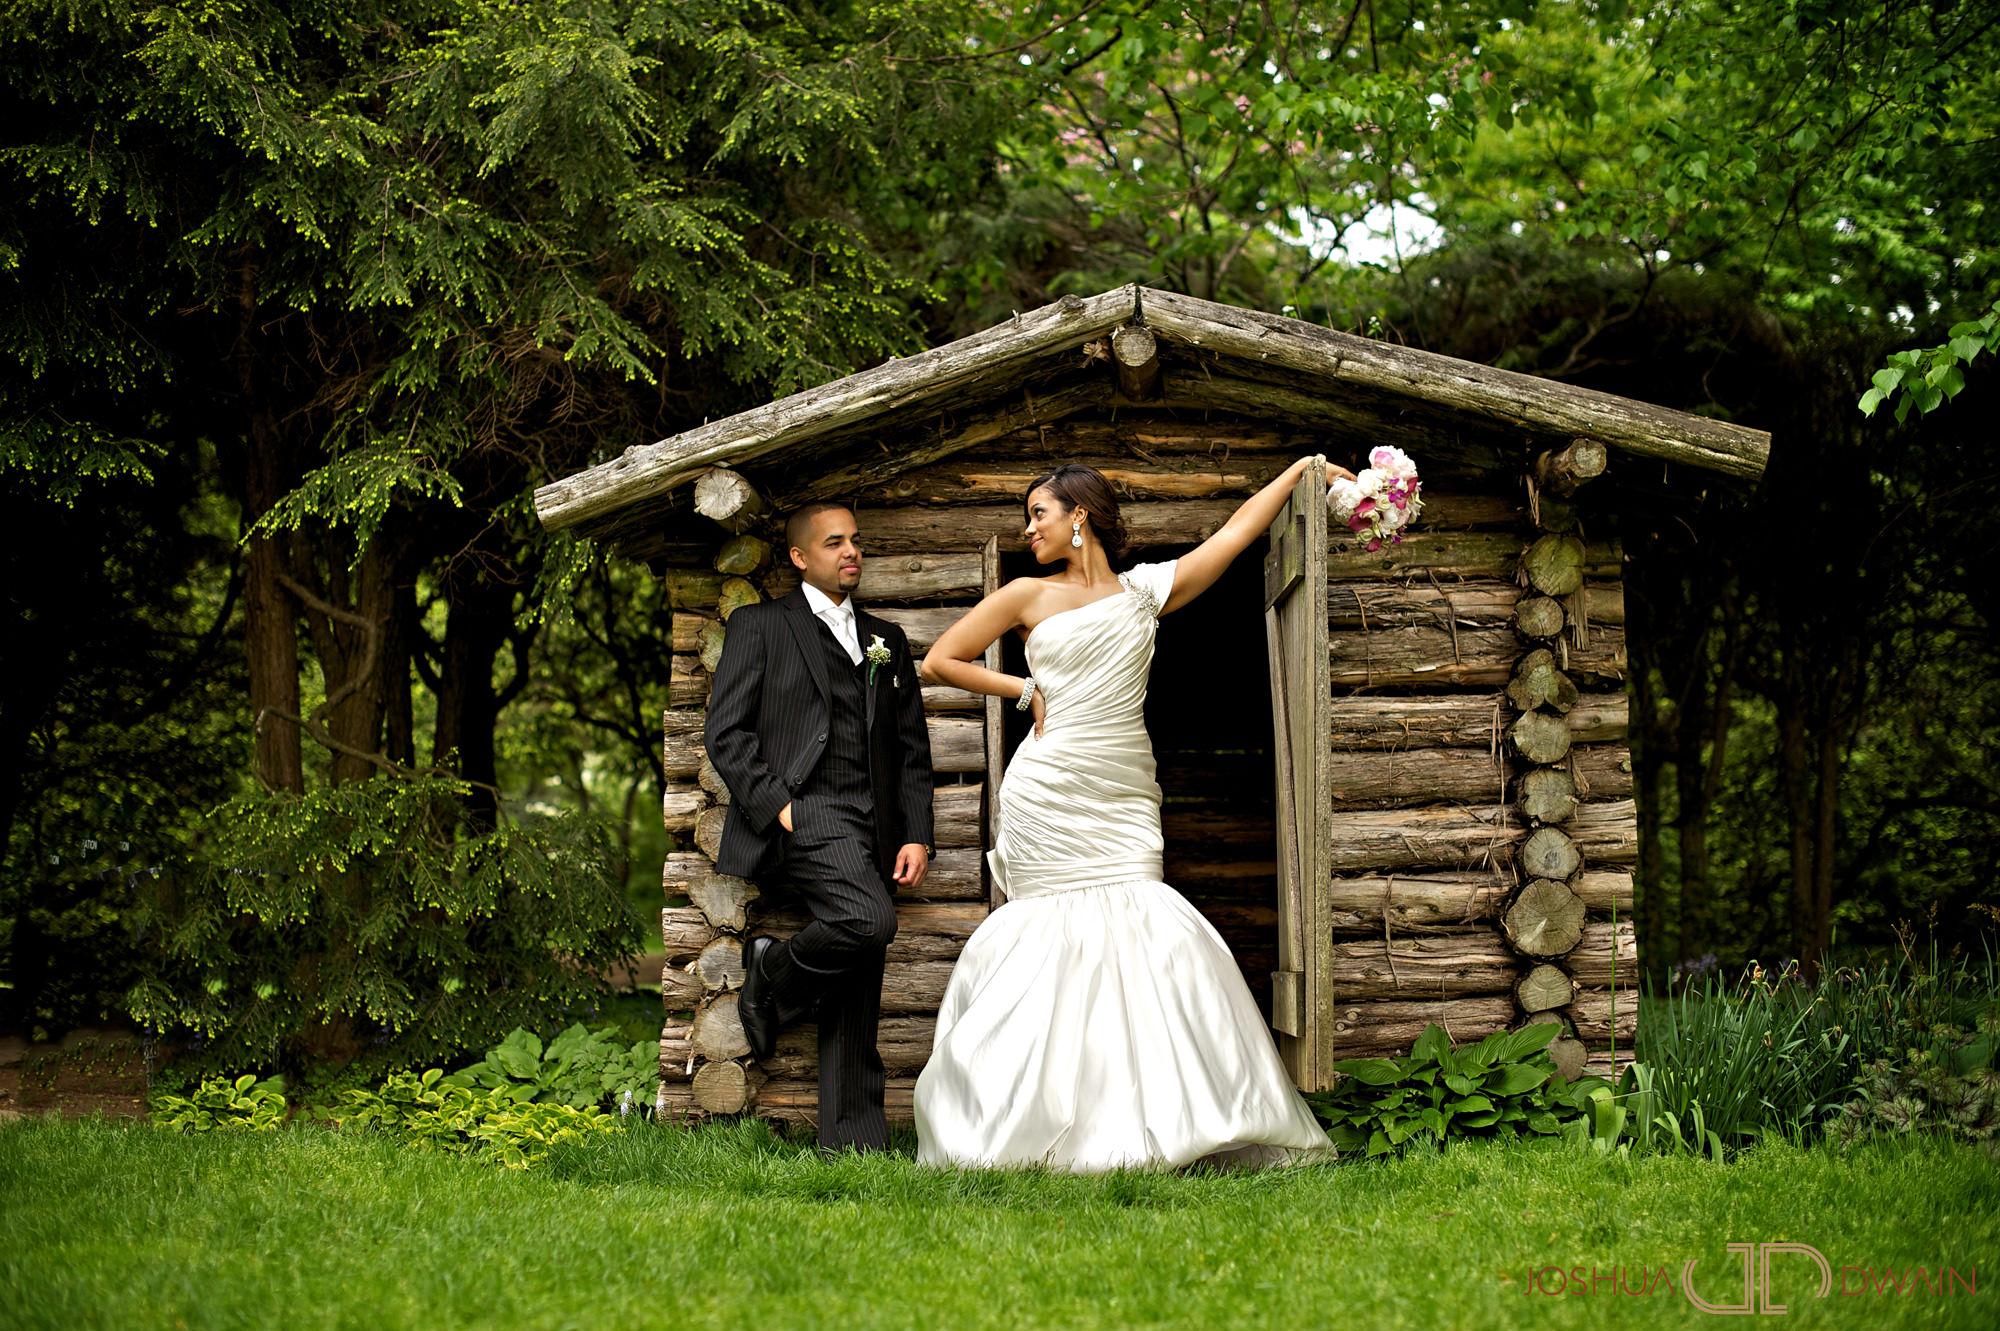 carolina-hector-017-chateau-briandlong-island-new-york-wedding-photographer-joshua-dwain-2011-05-13_ch_0468